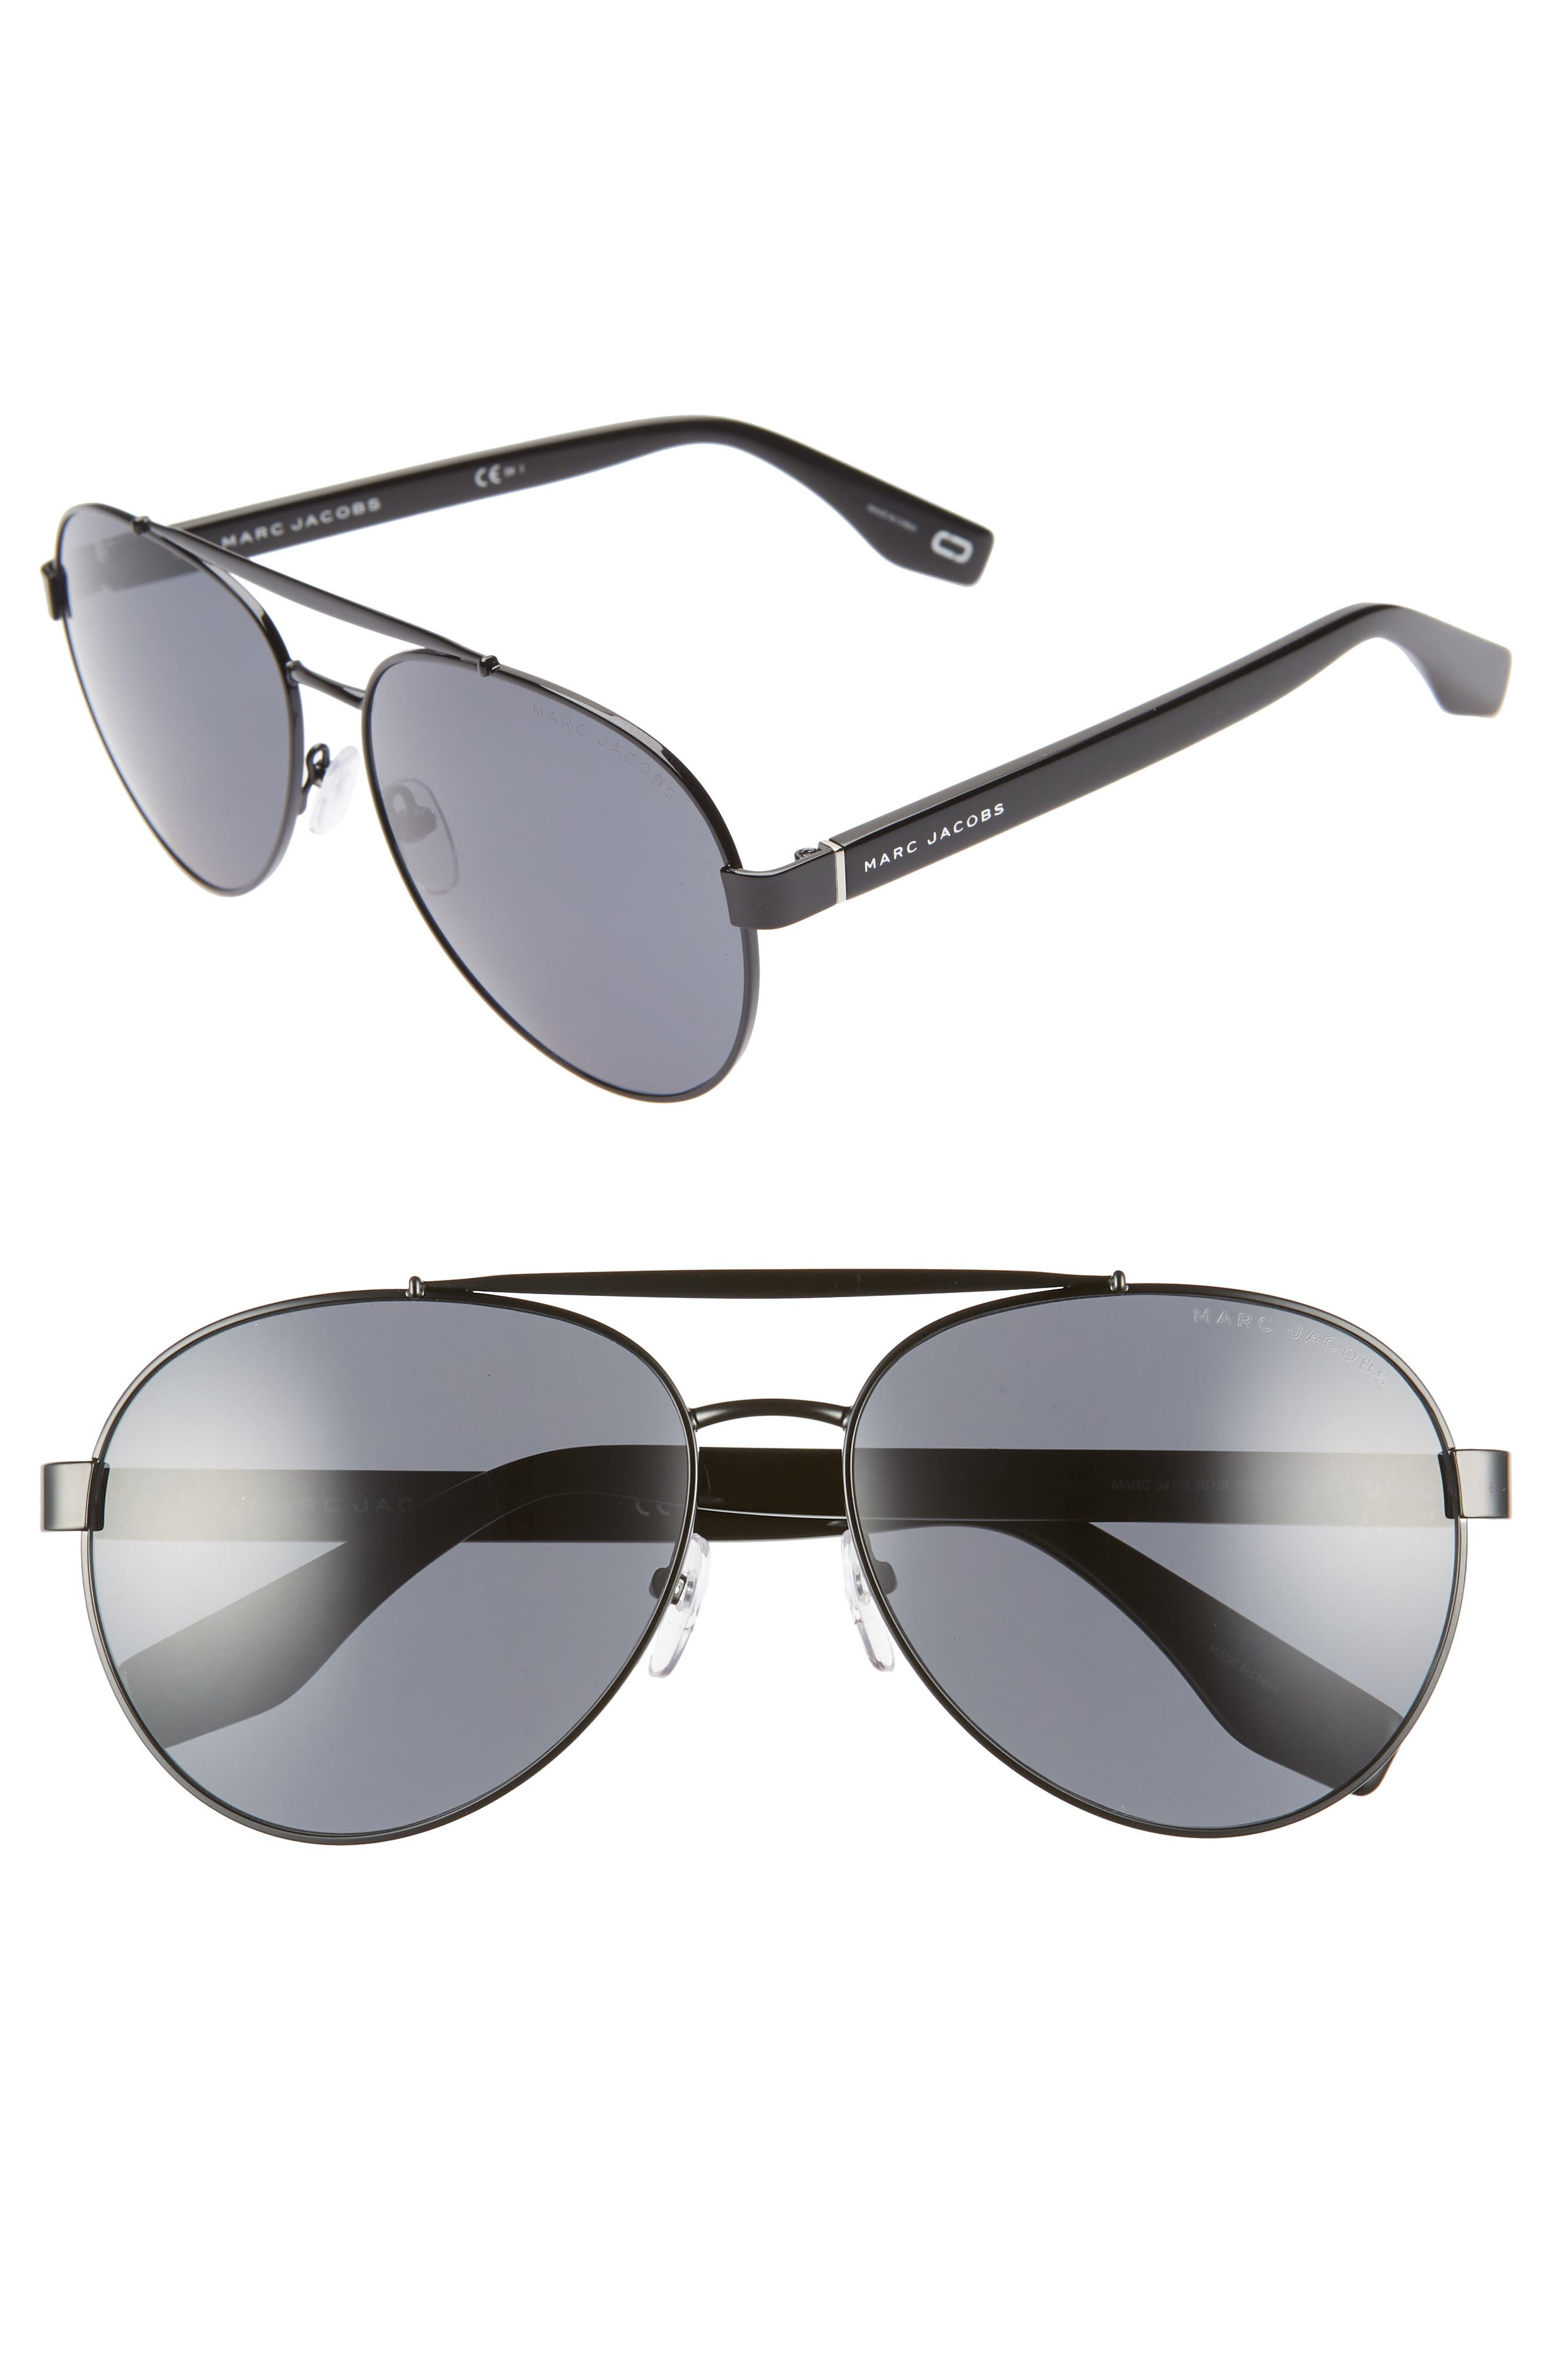 60mm Aviator Sunglasses,                             Main thumbnail 1, color,                             BLACK